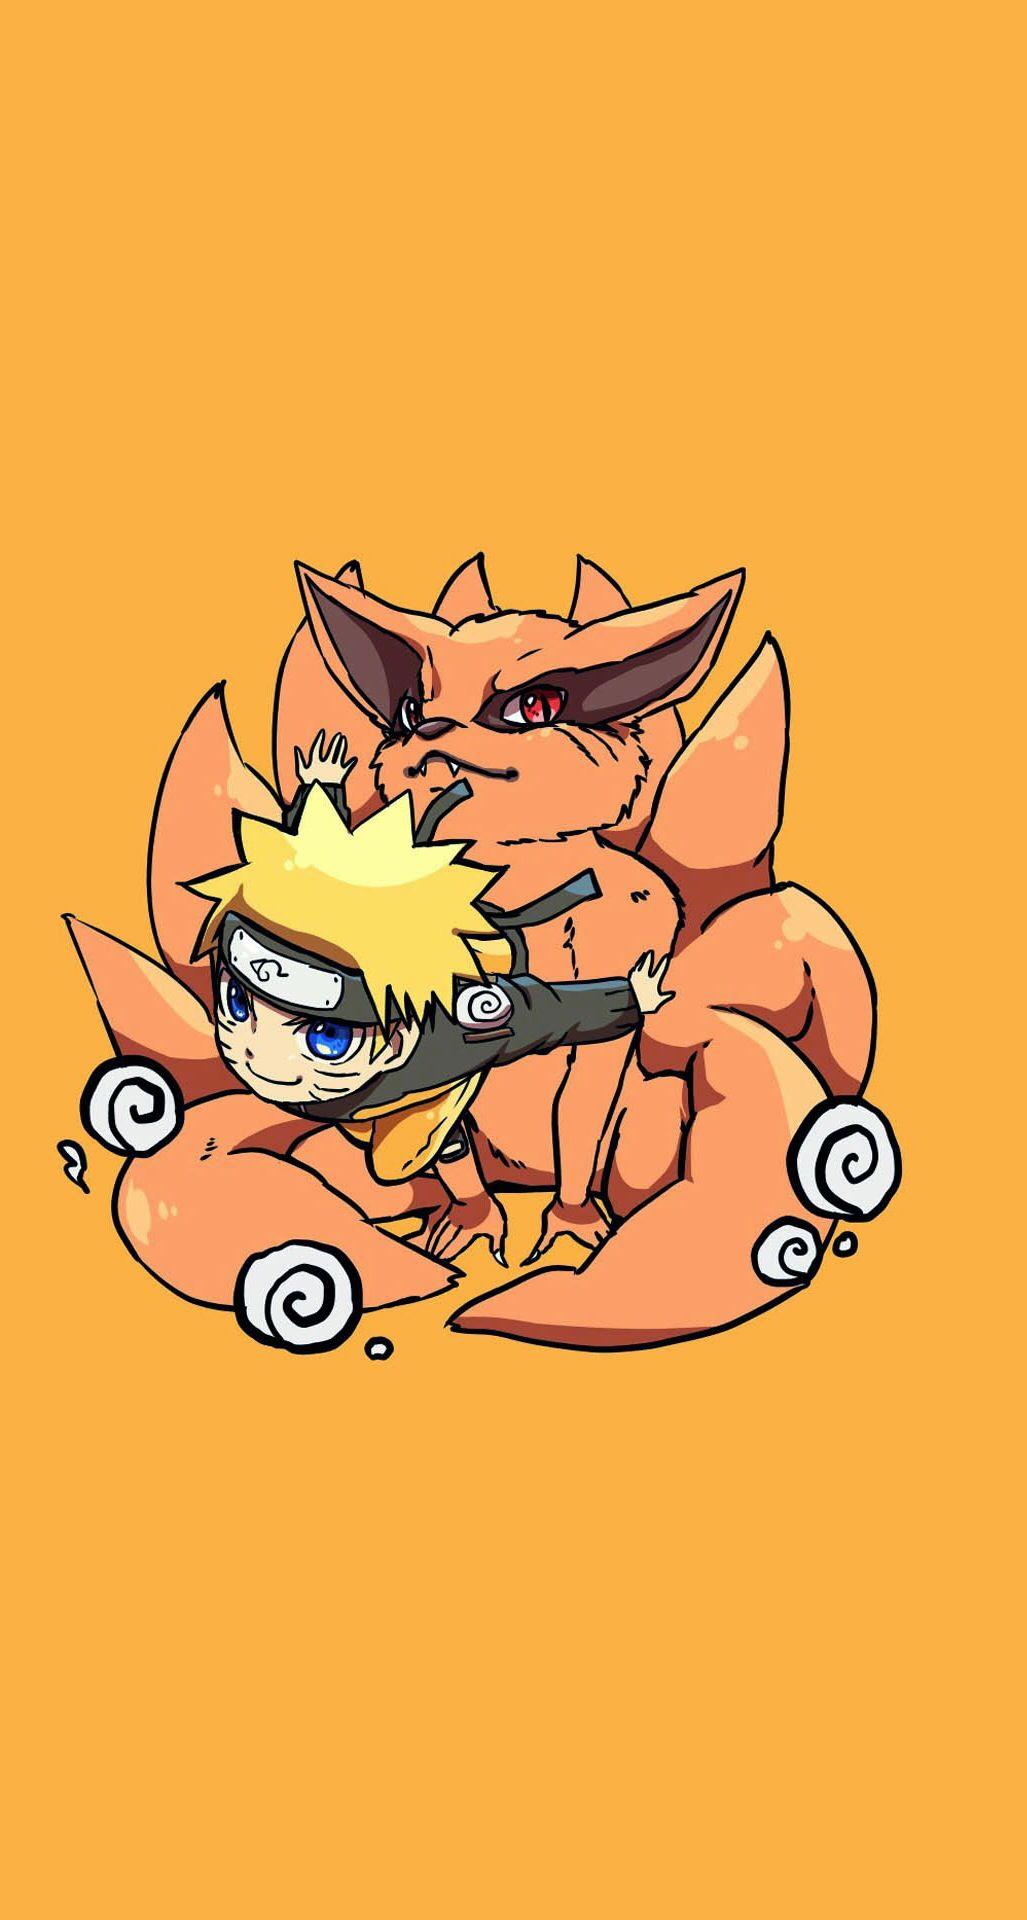 Popular Wallpaper Naruto Cute - fab3ad2582f9446b1025466e0d7b60cf  Gallery_97214.jpg